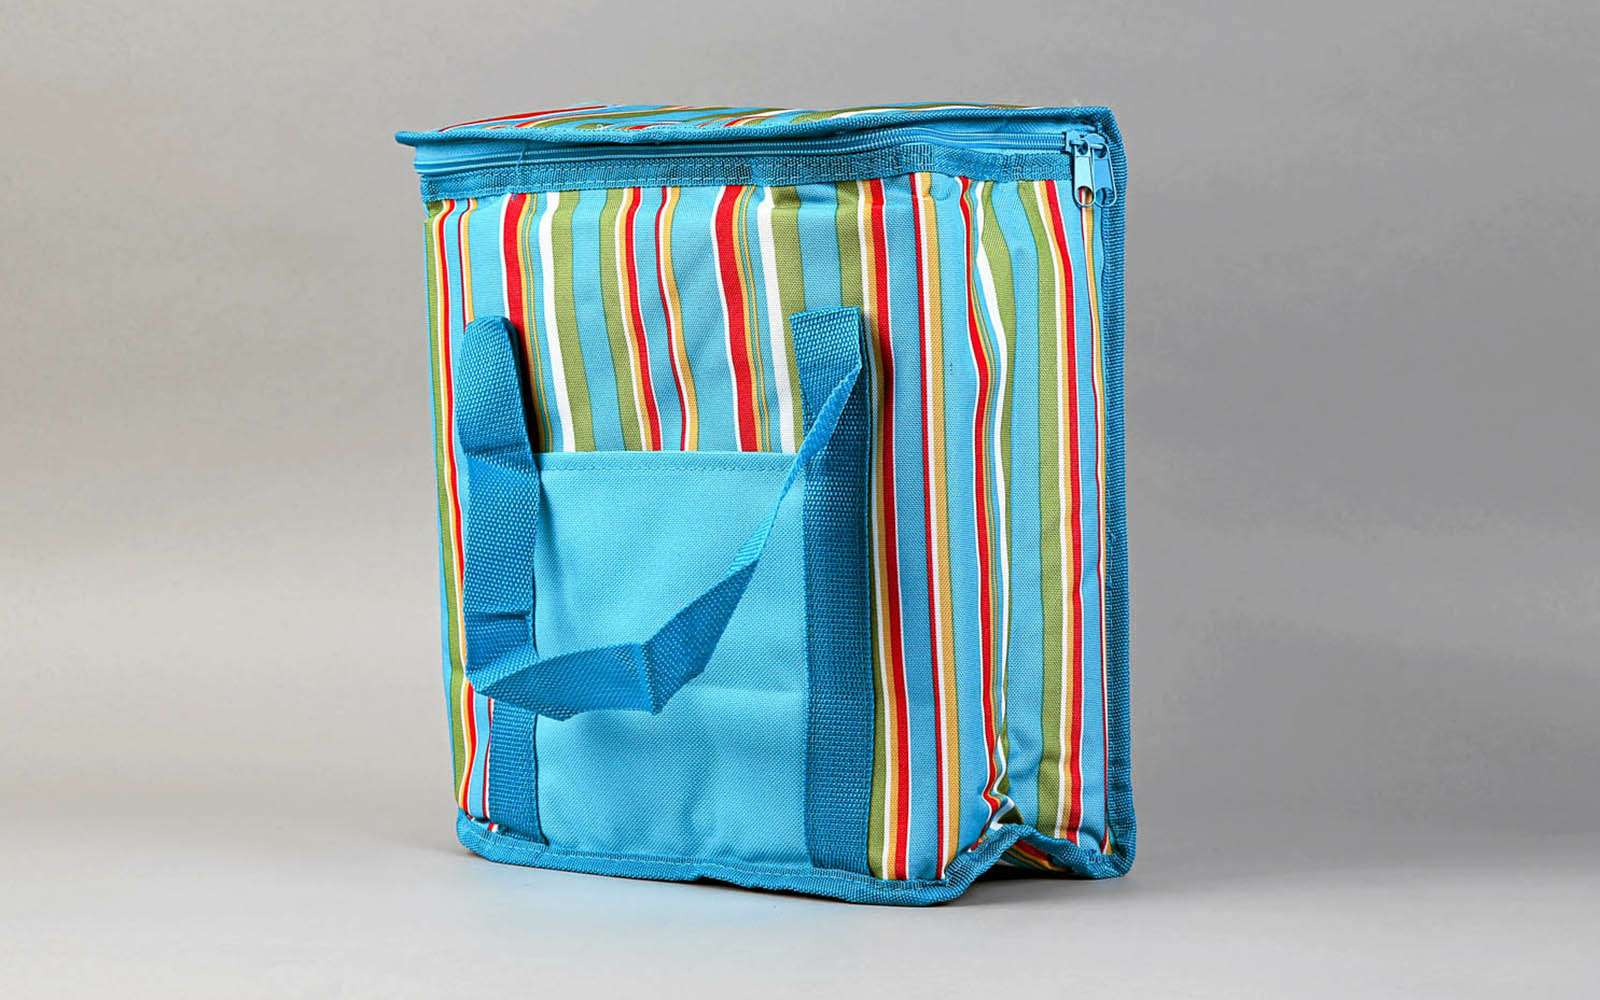 Тест девяти сумок-холодильников: теория теплообмена— фото 612410